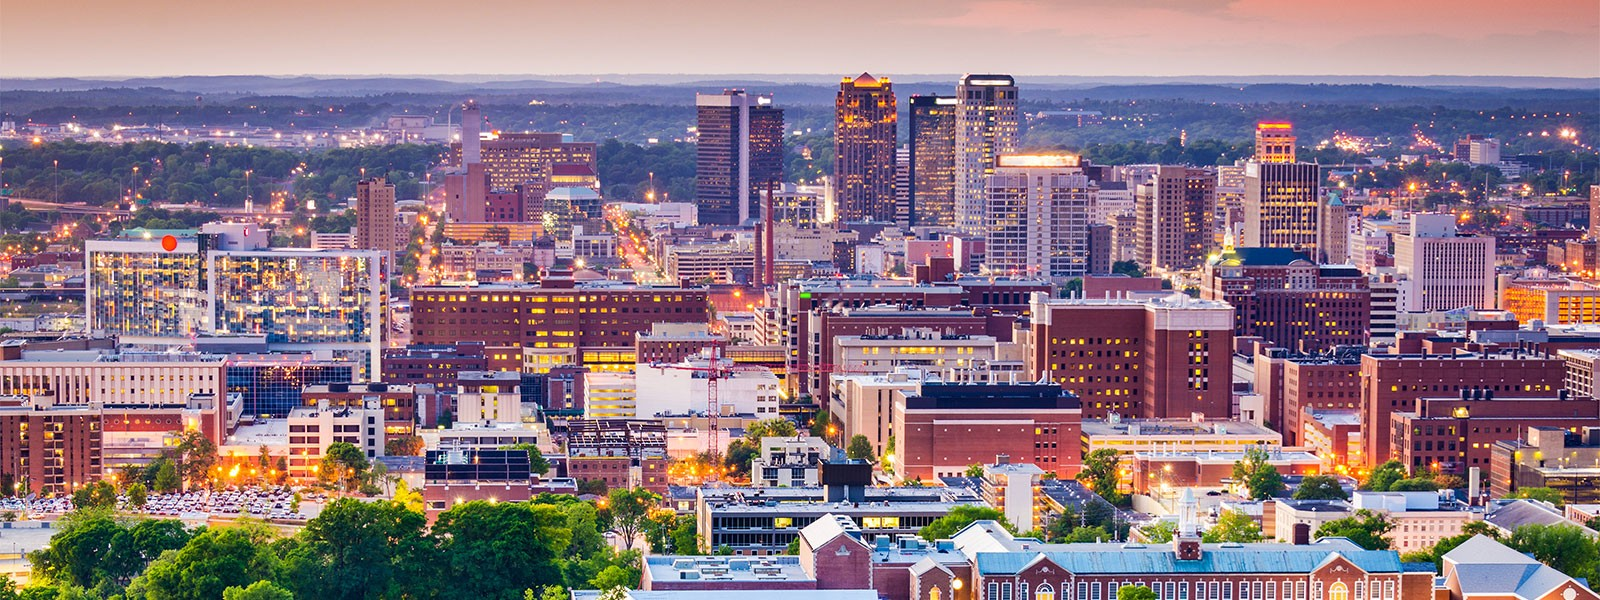 Contact Spartan Invest - Birmingham, AL